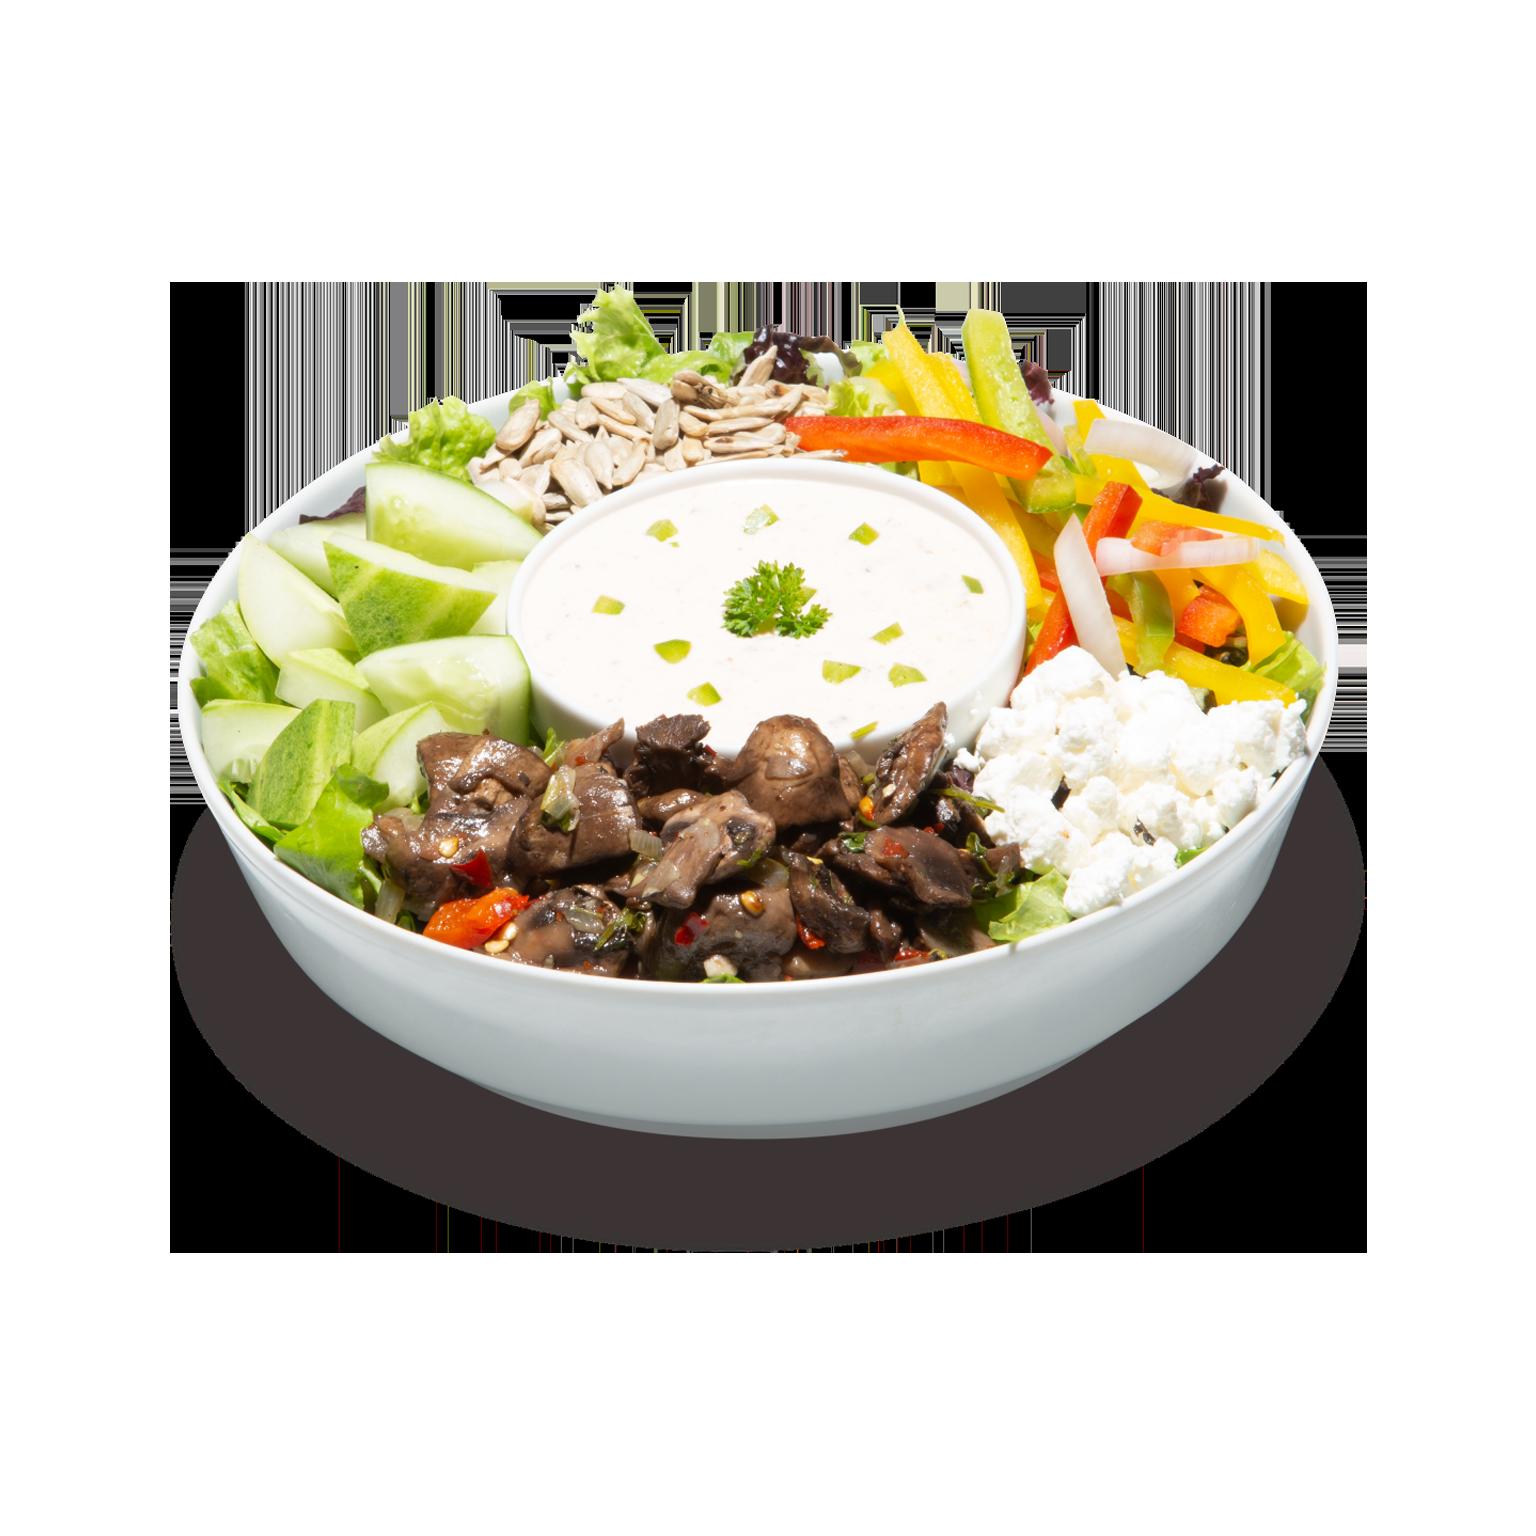 Tex-Mex Ranch salad